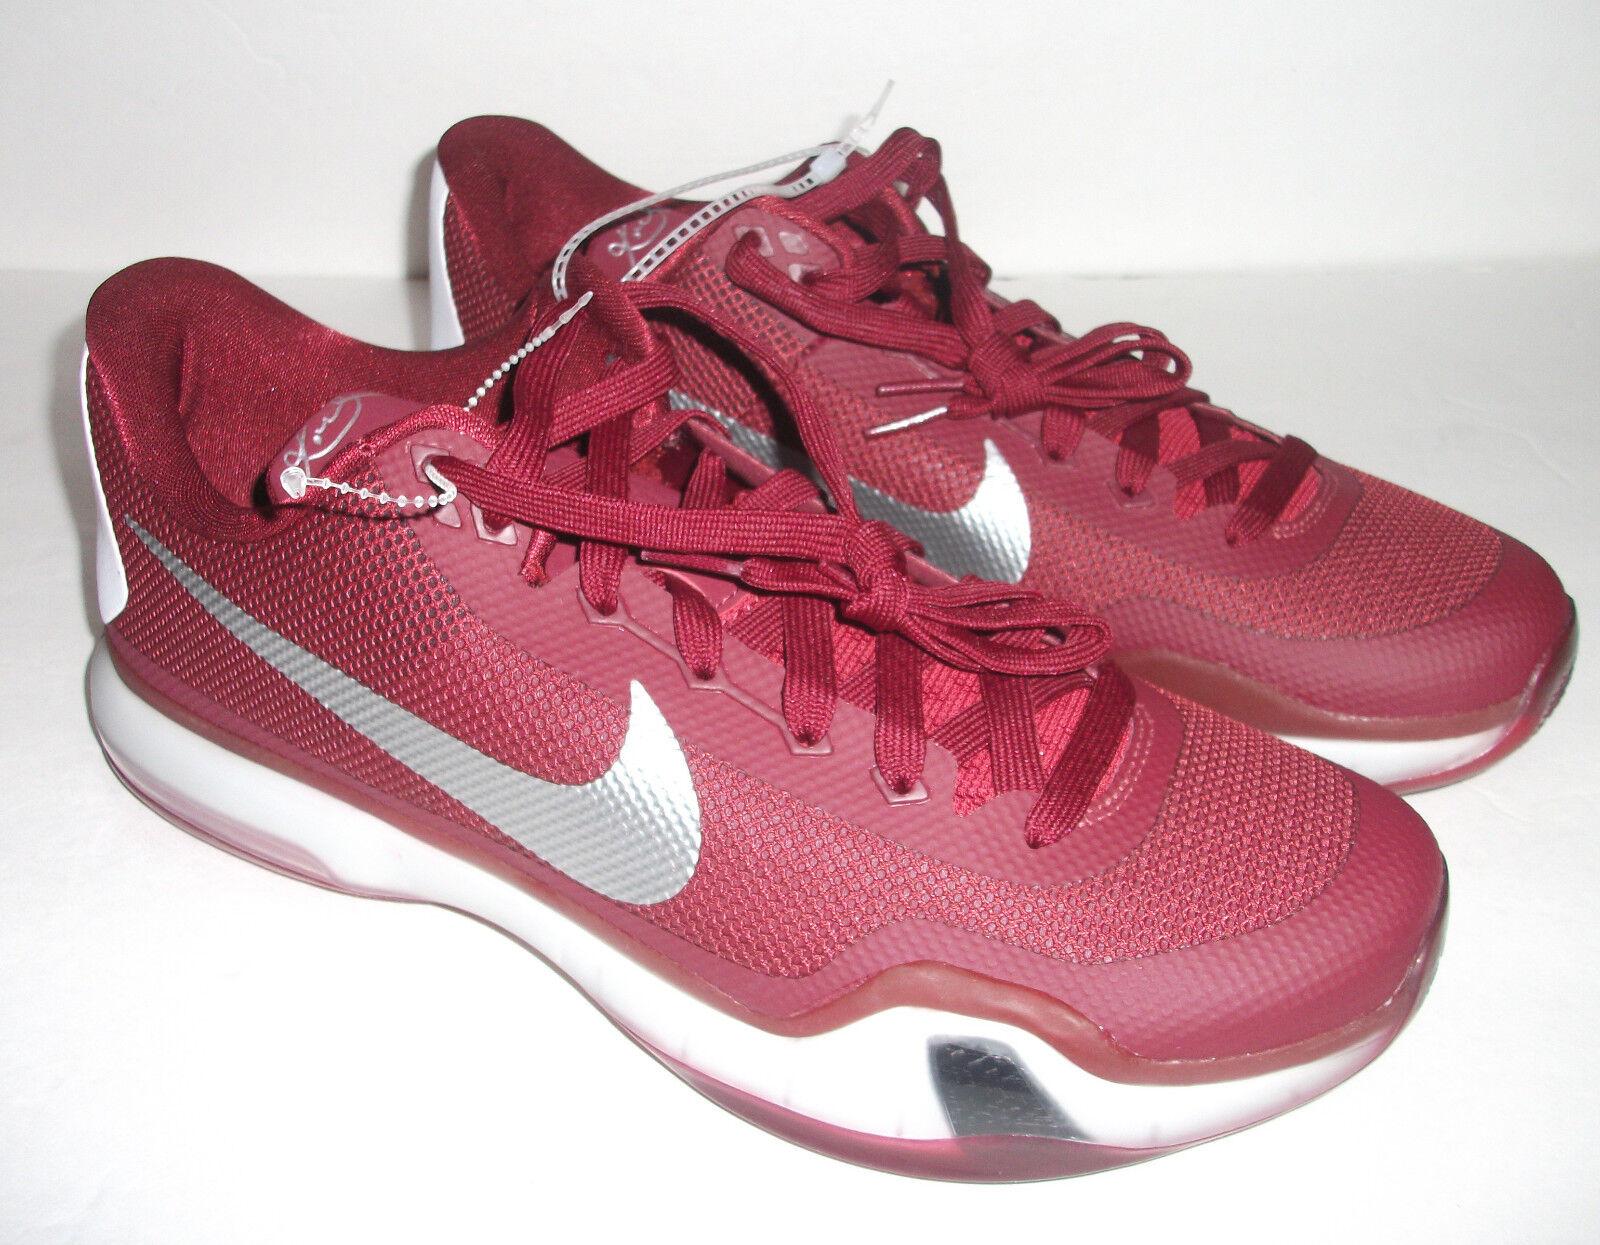 Nuove nike x 10 tb basket, basket, tb multi dimensioni, rossa, 813030 601 8fb991